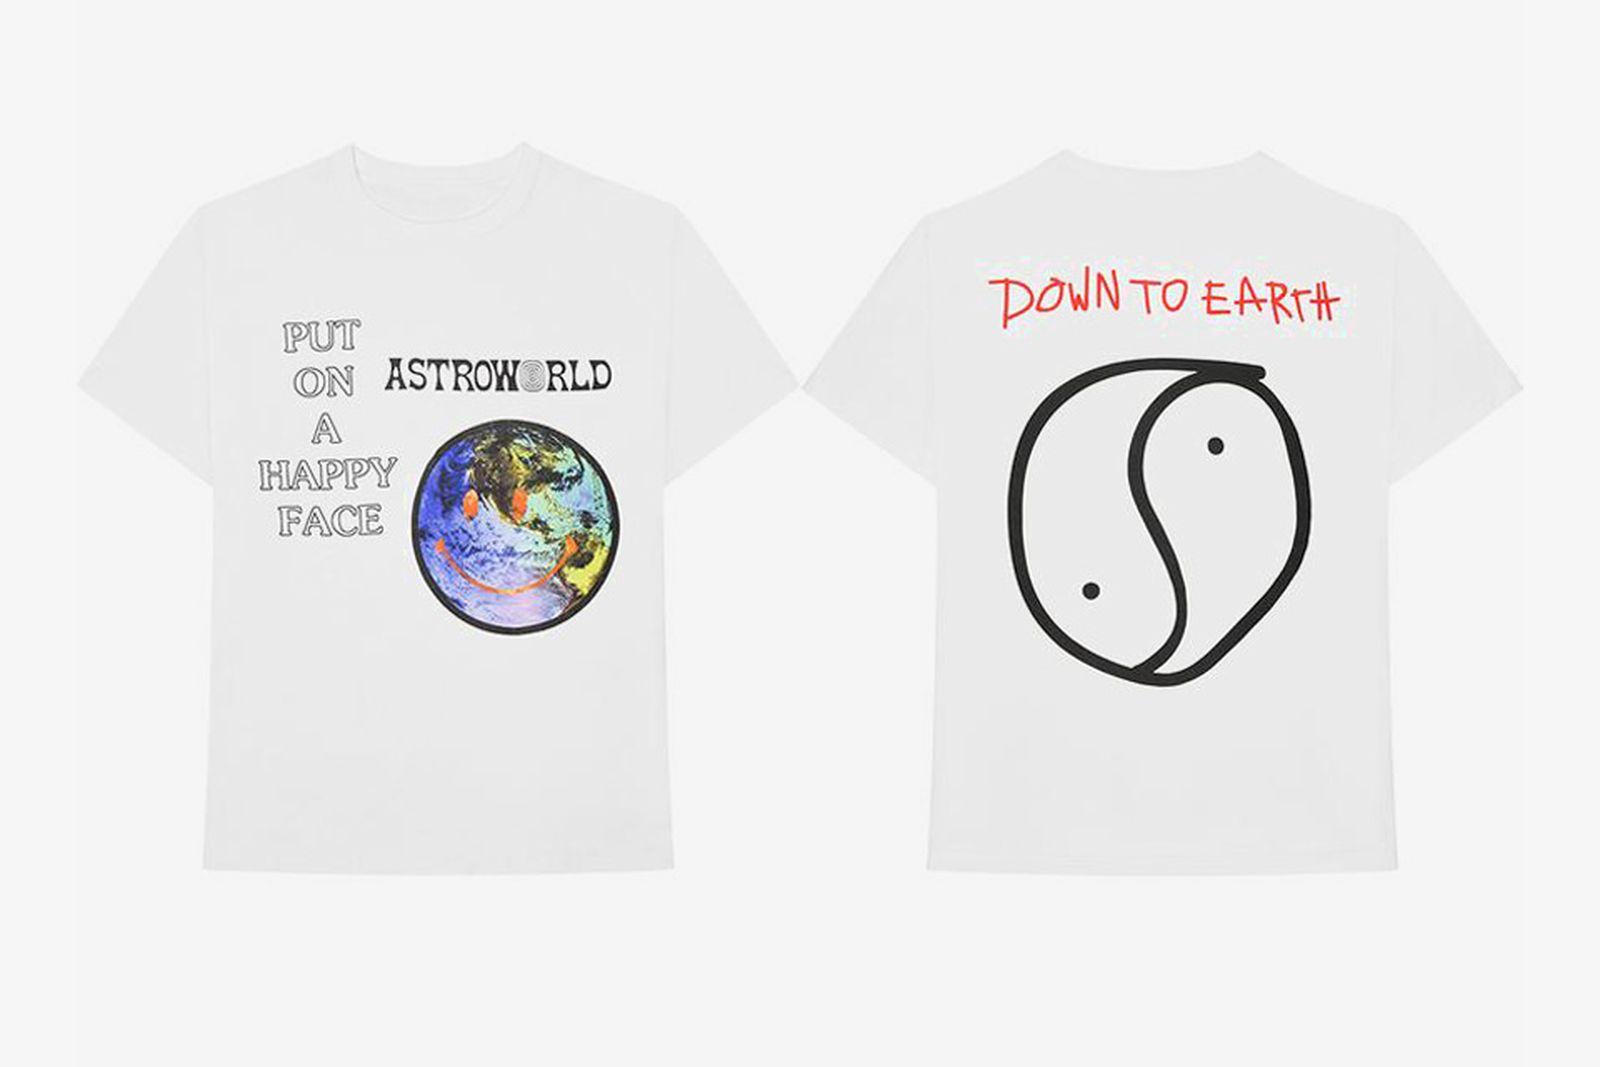 travis scott astroworld merch collection ASAP Ferg Merchandise brockhampton